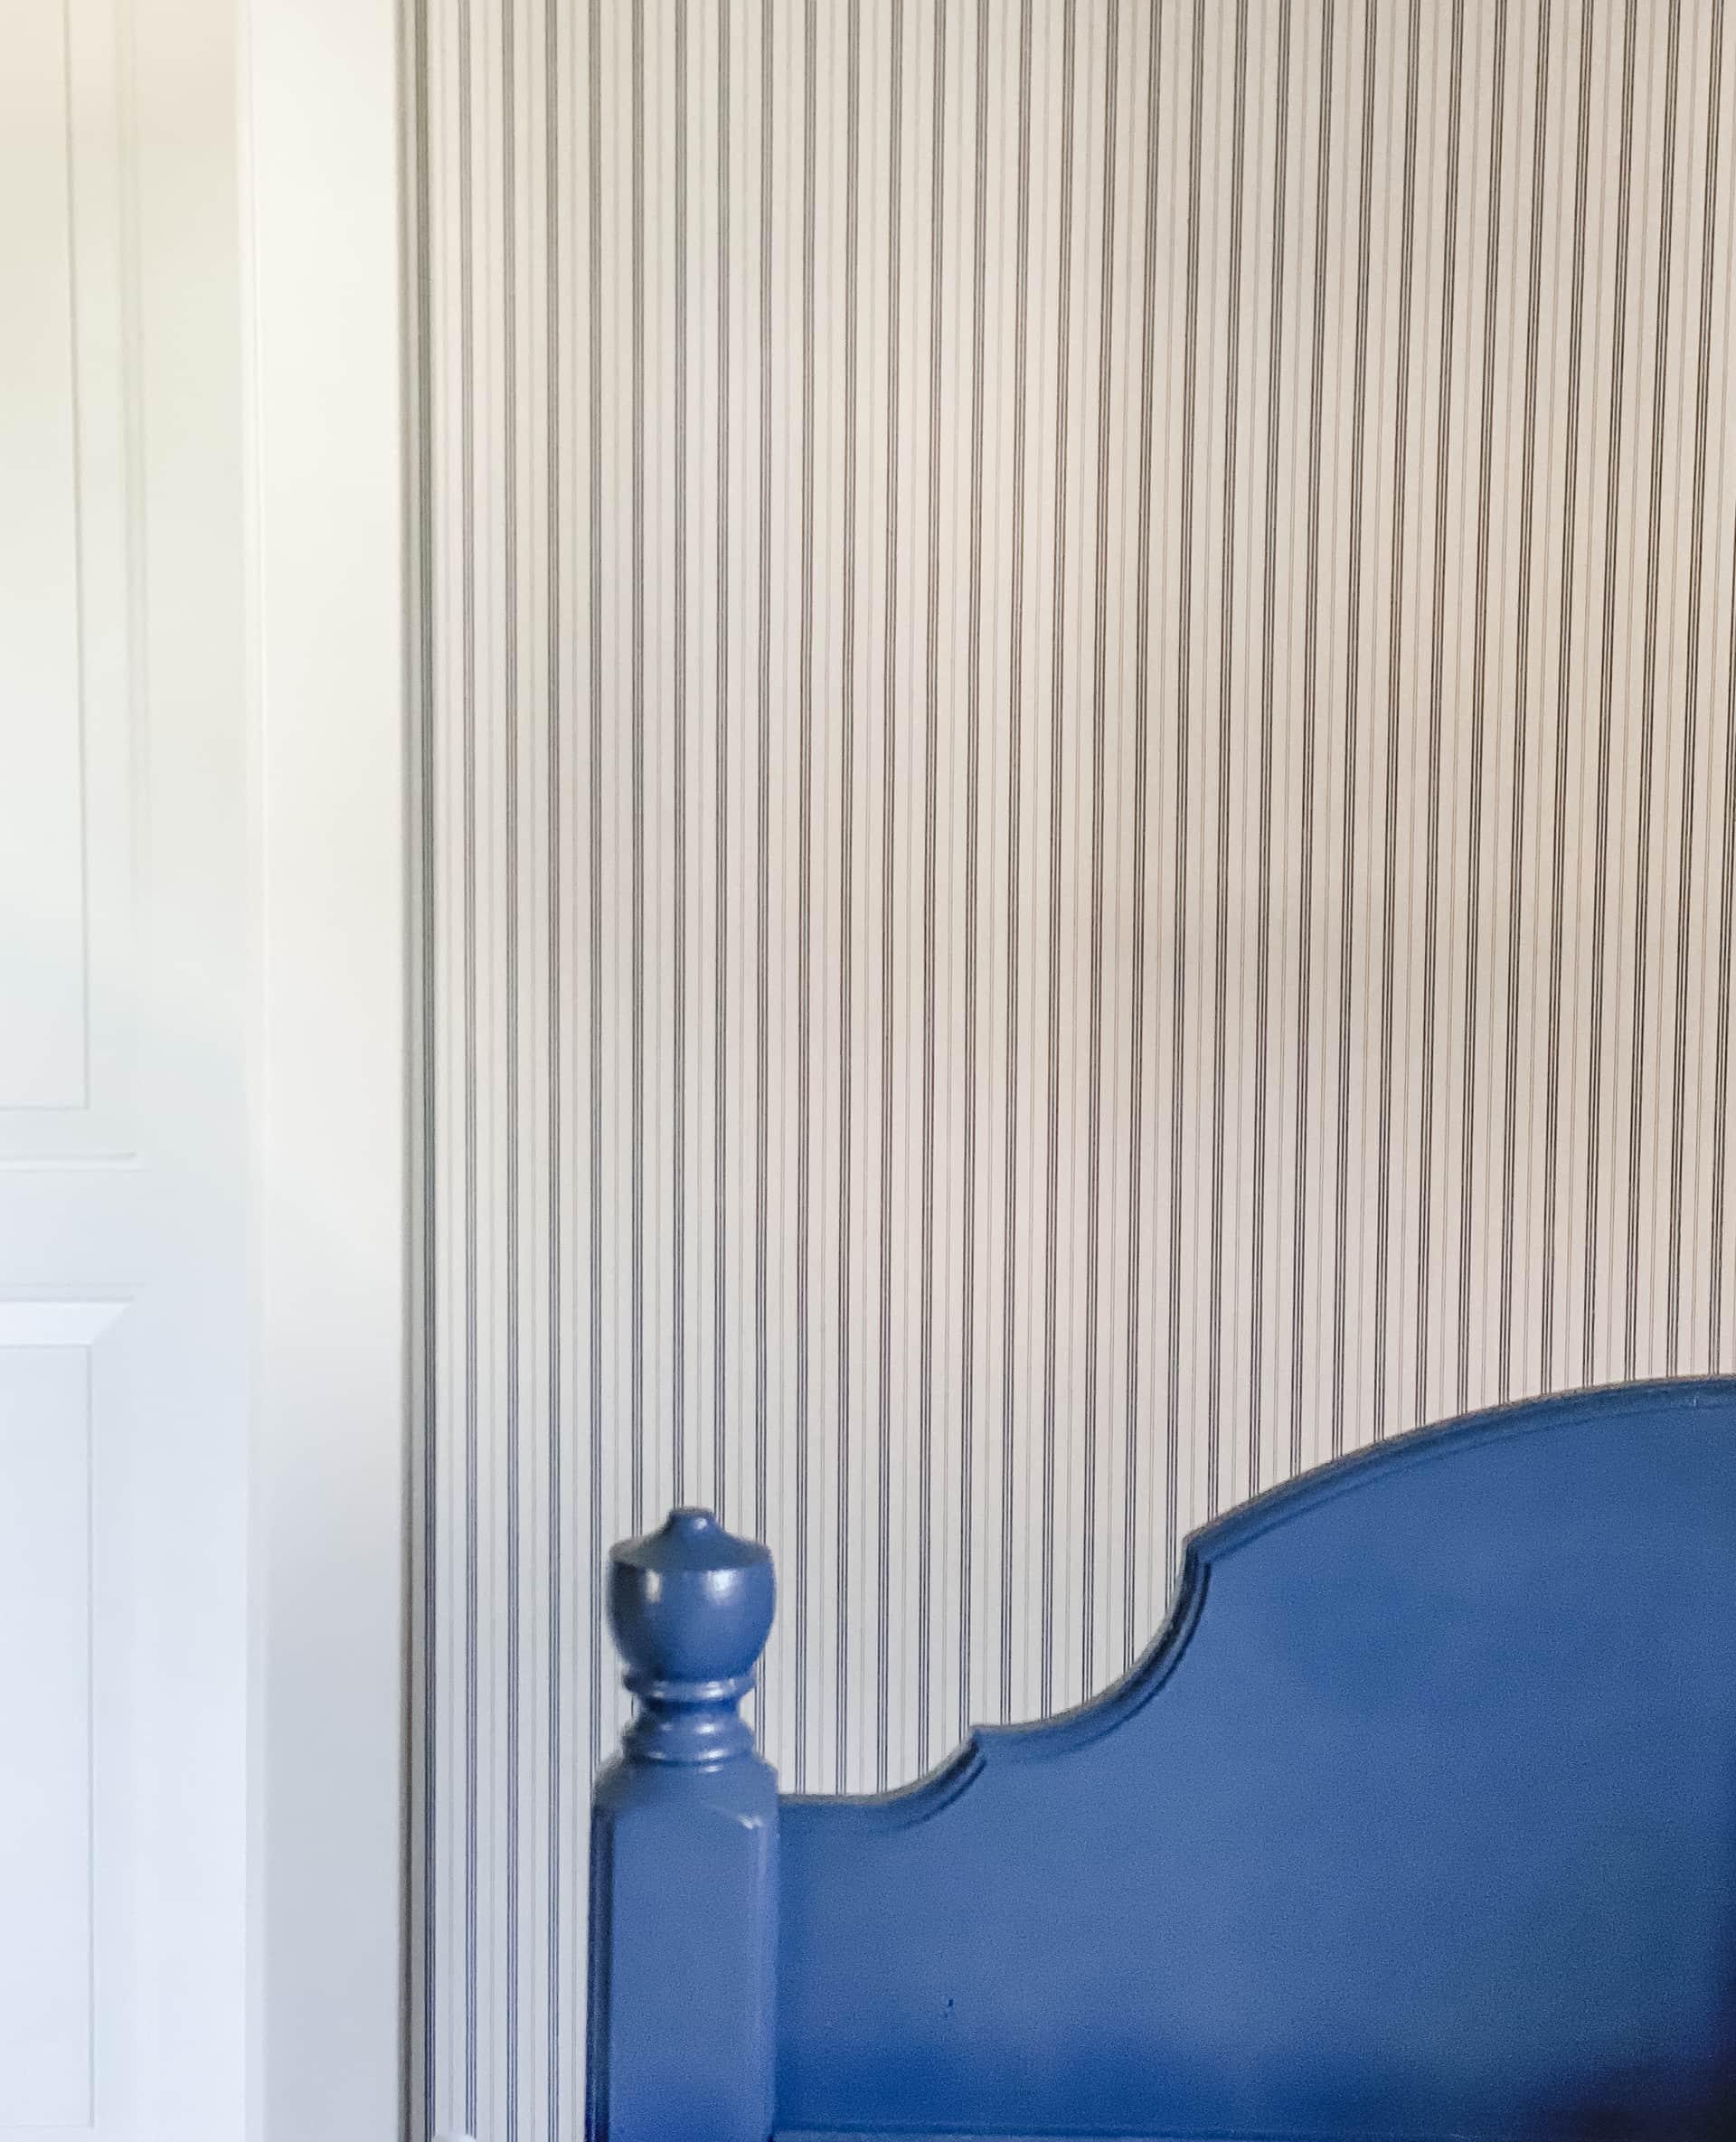 gammel blå seng, stripet tapet